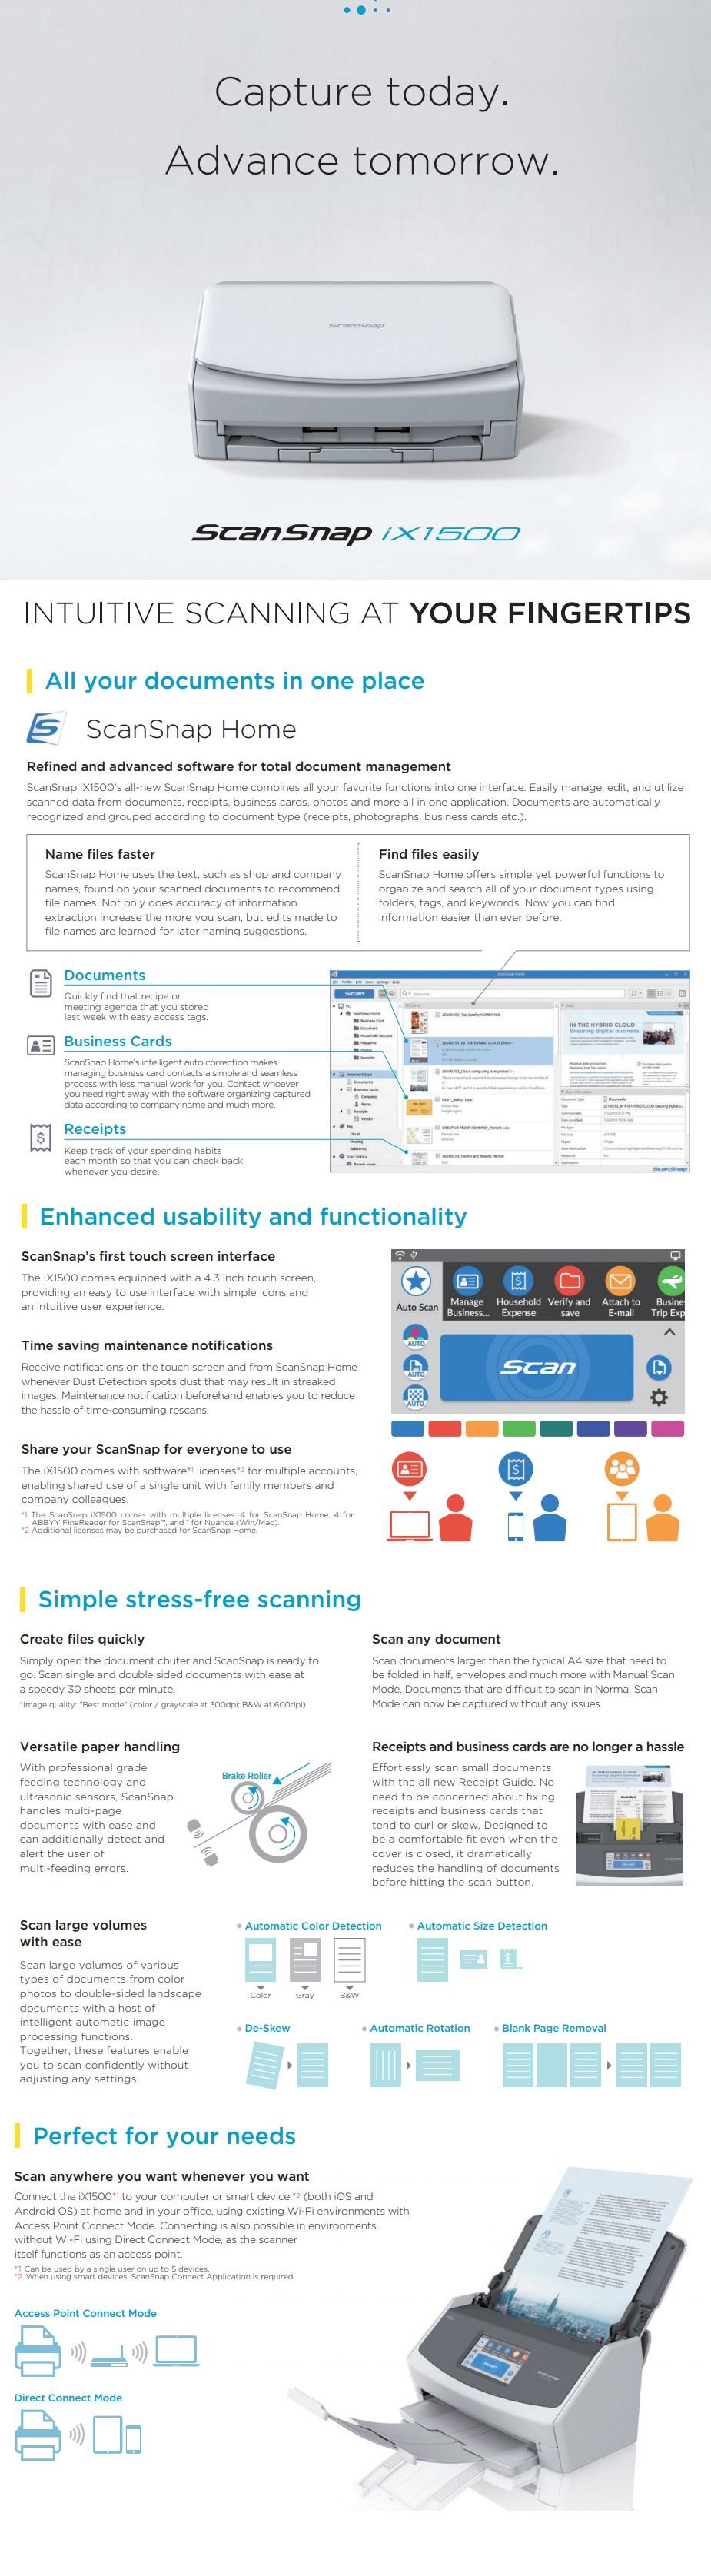 Fujitsu ScanSnap iX1500 A4 Duplex Scanner - Desktop Overview 1